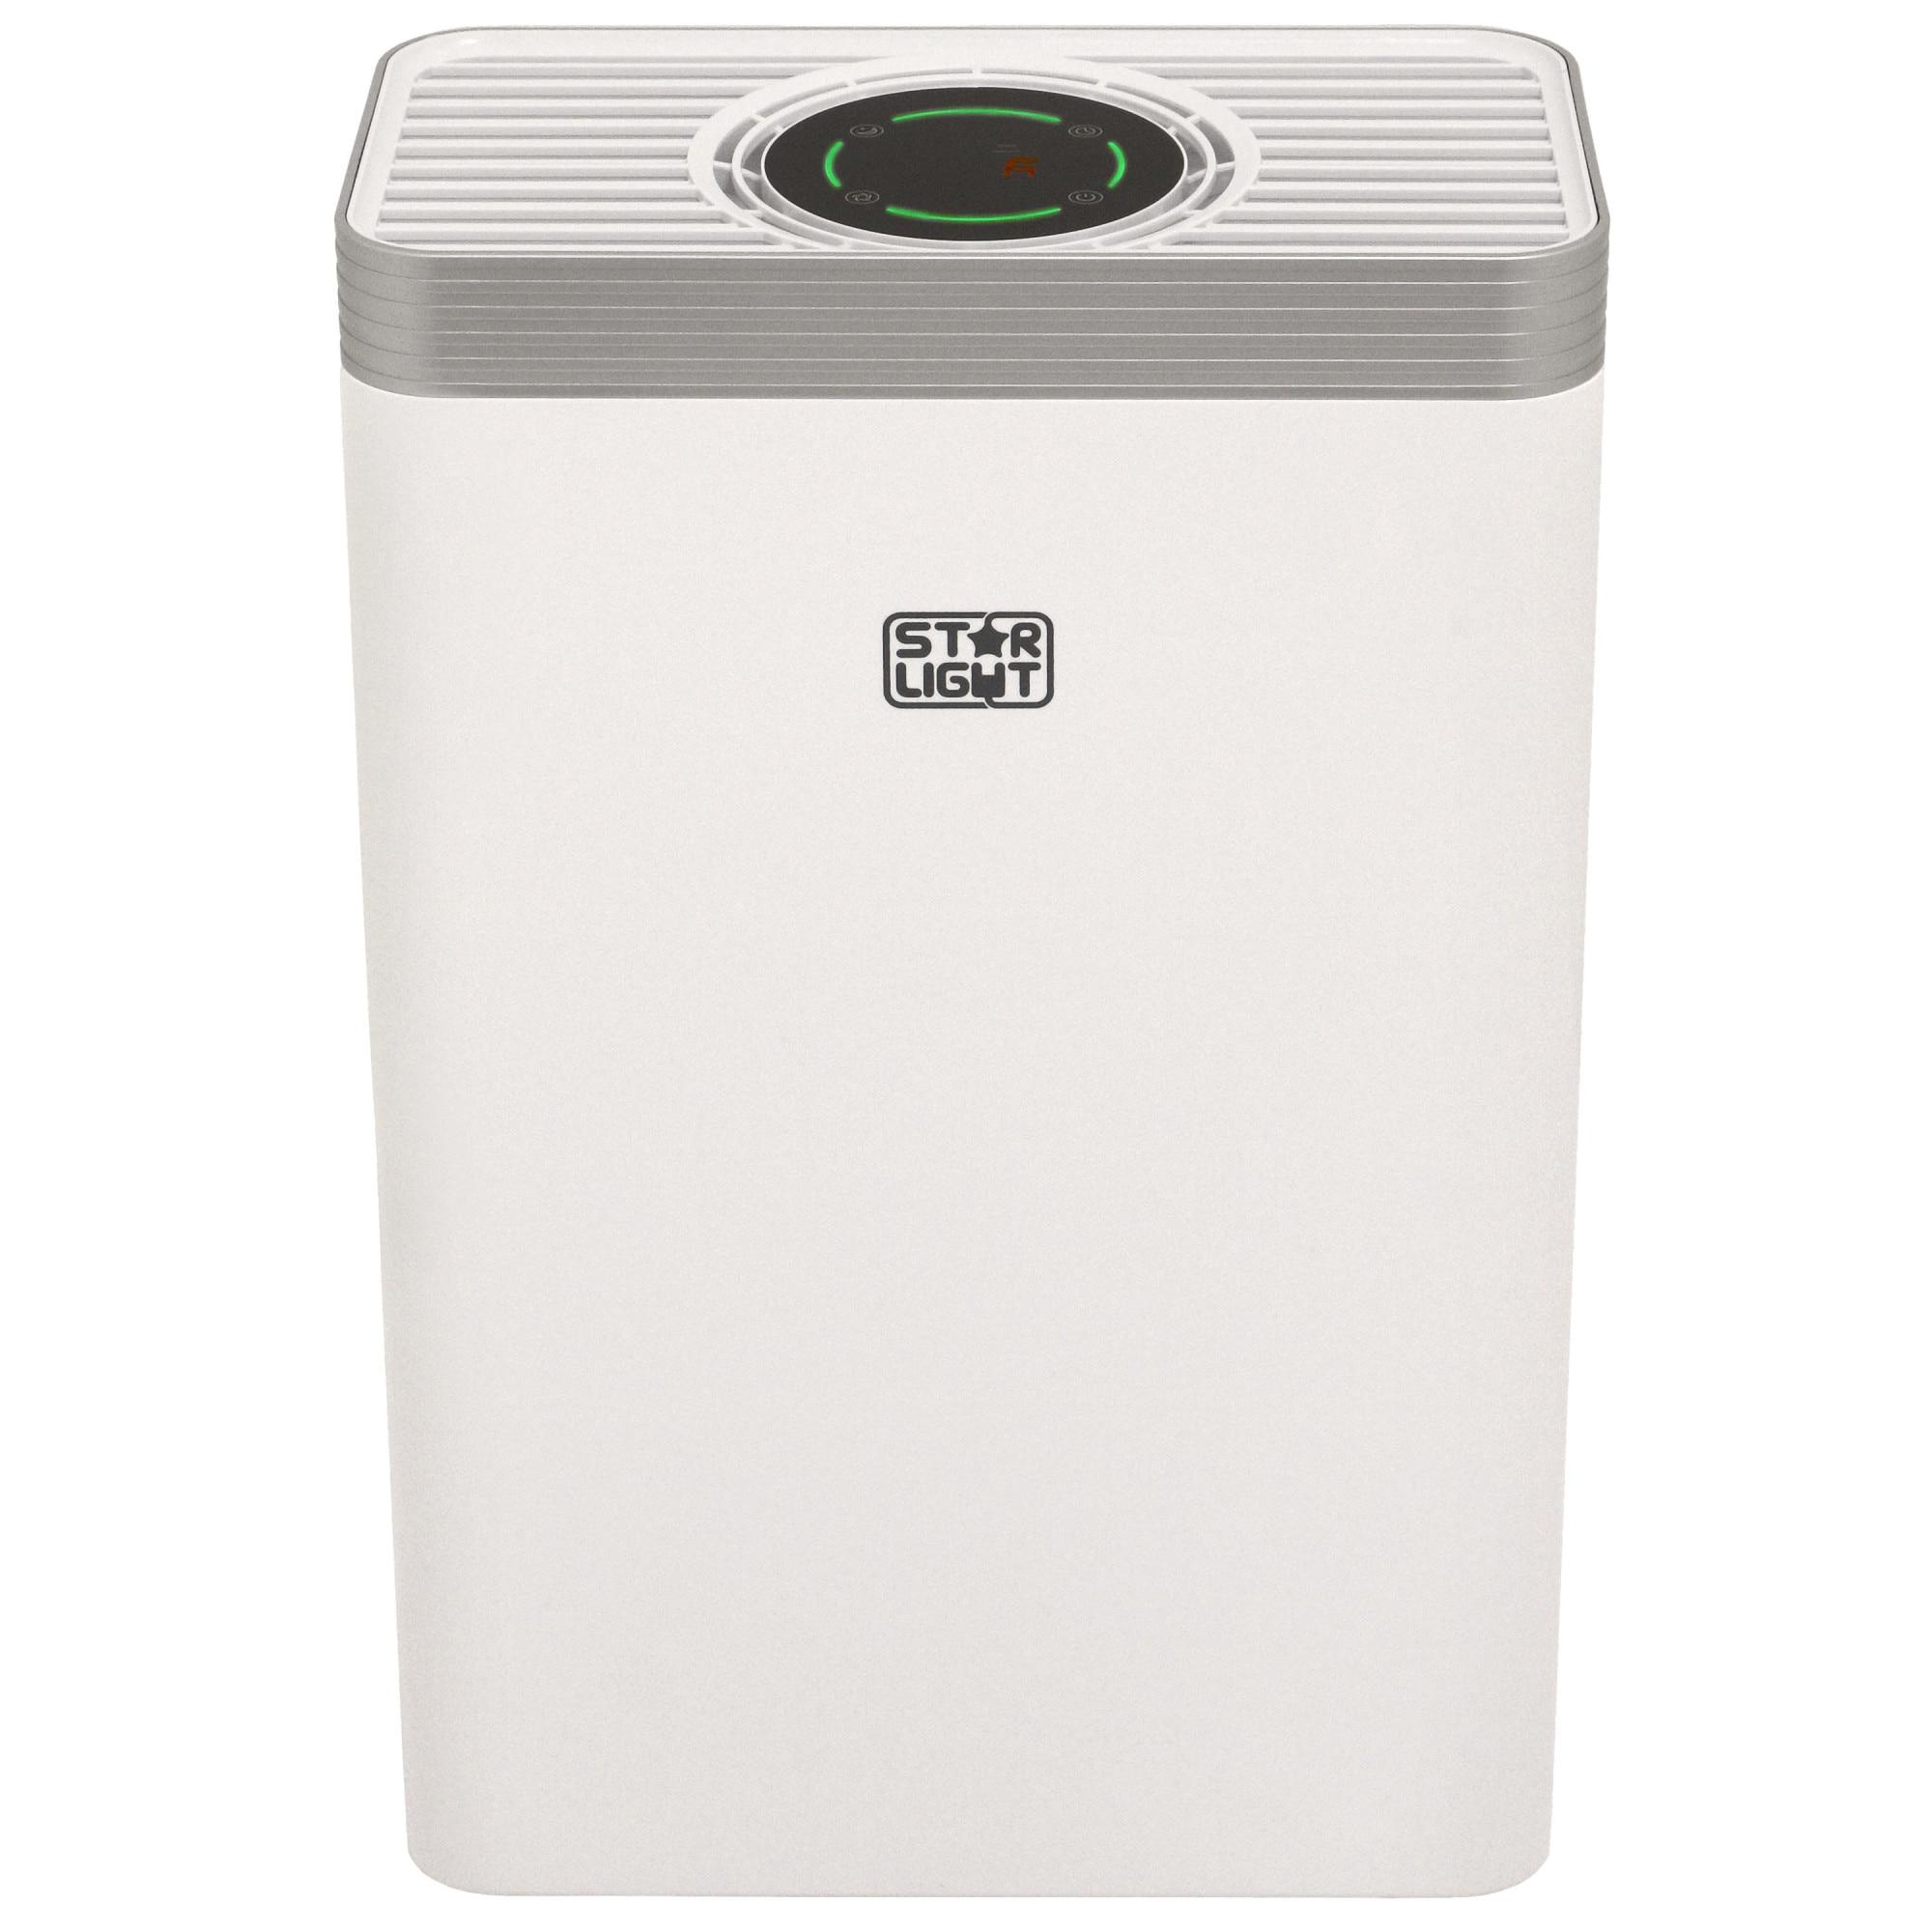 Fotografie Purificator de aer Star-Light APH-2125W, 210 m3/h, 5 niveluri de filtrare, Indicator calitate aer, Timer, Mod Auto, Alb